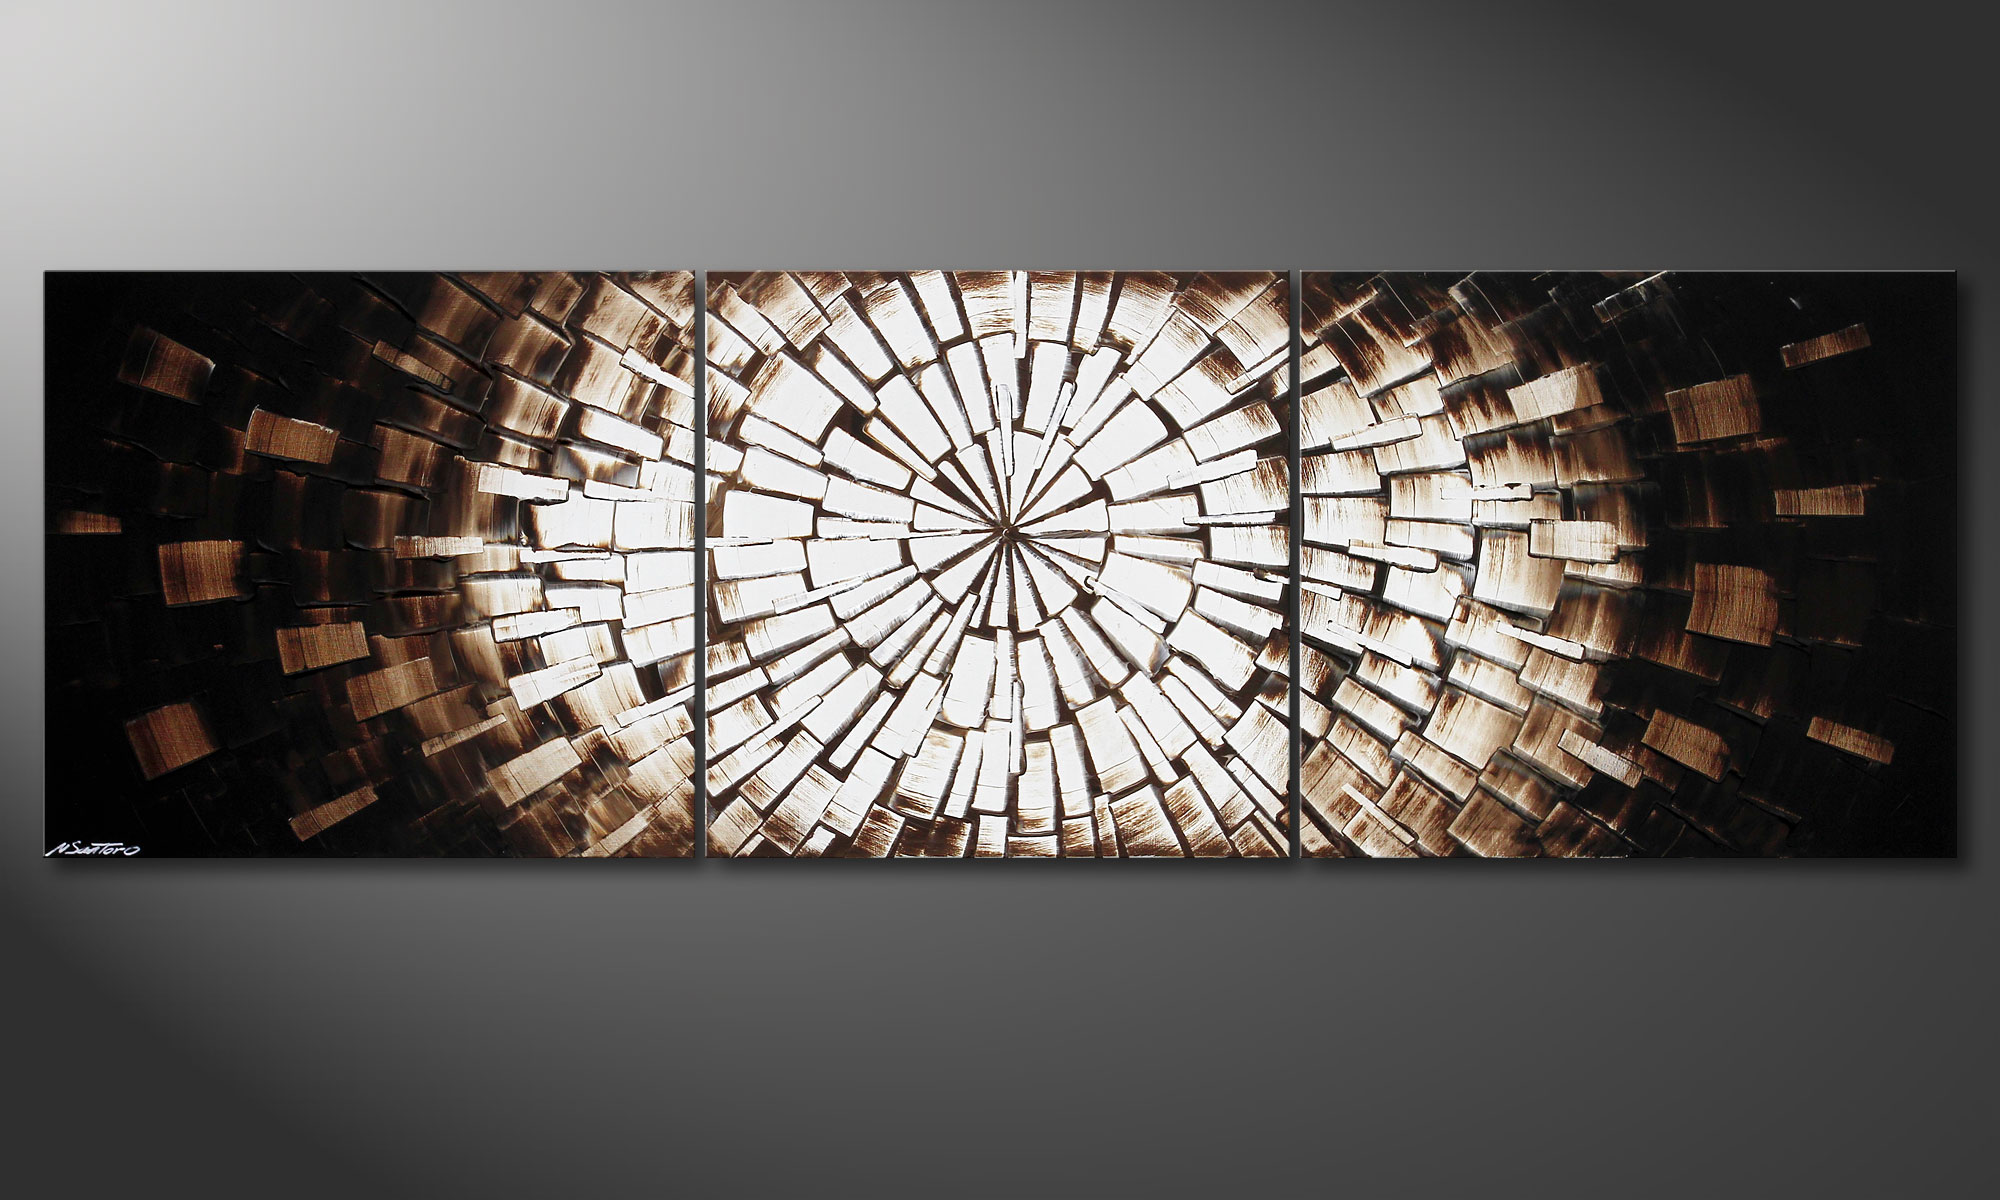 das xxl bild center of babylon 260x80cm wandbilder xxl. Black Bedroom Furniture Sets. Home Design Ideas